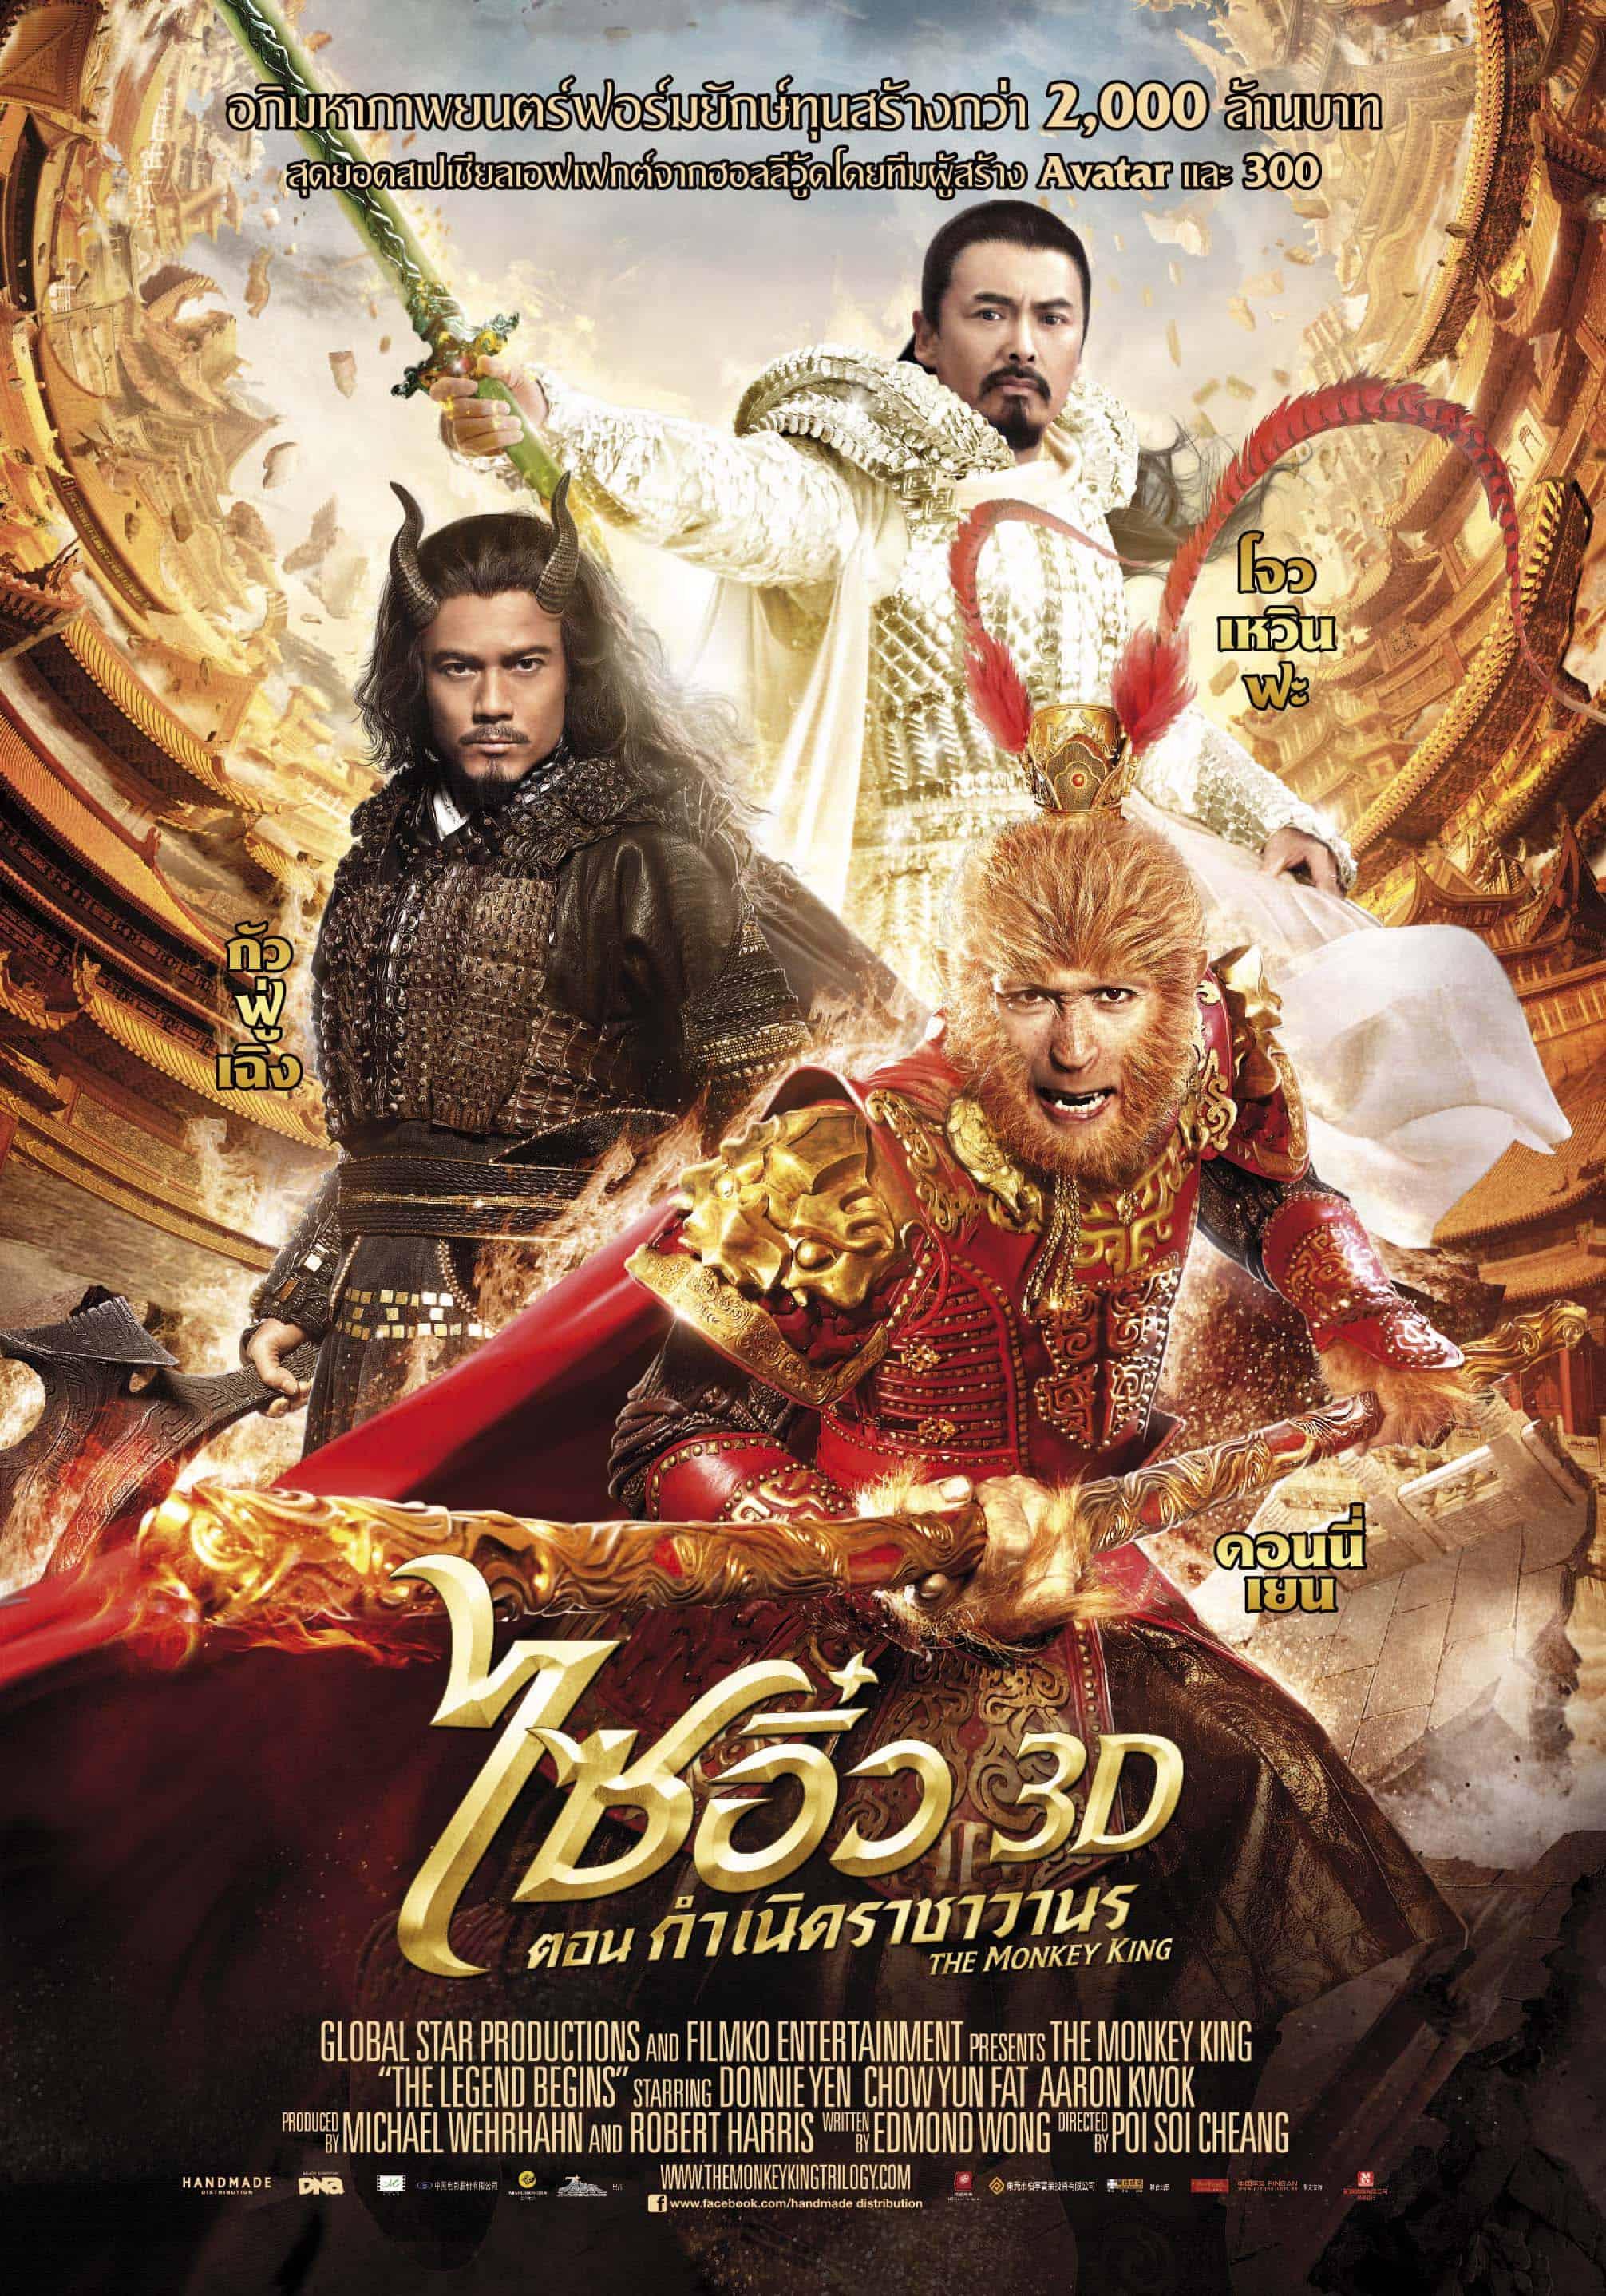 The Monkey king (2014) ไซอิ๋ว ตอน กำเนิดราชาวานร